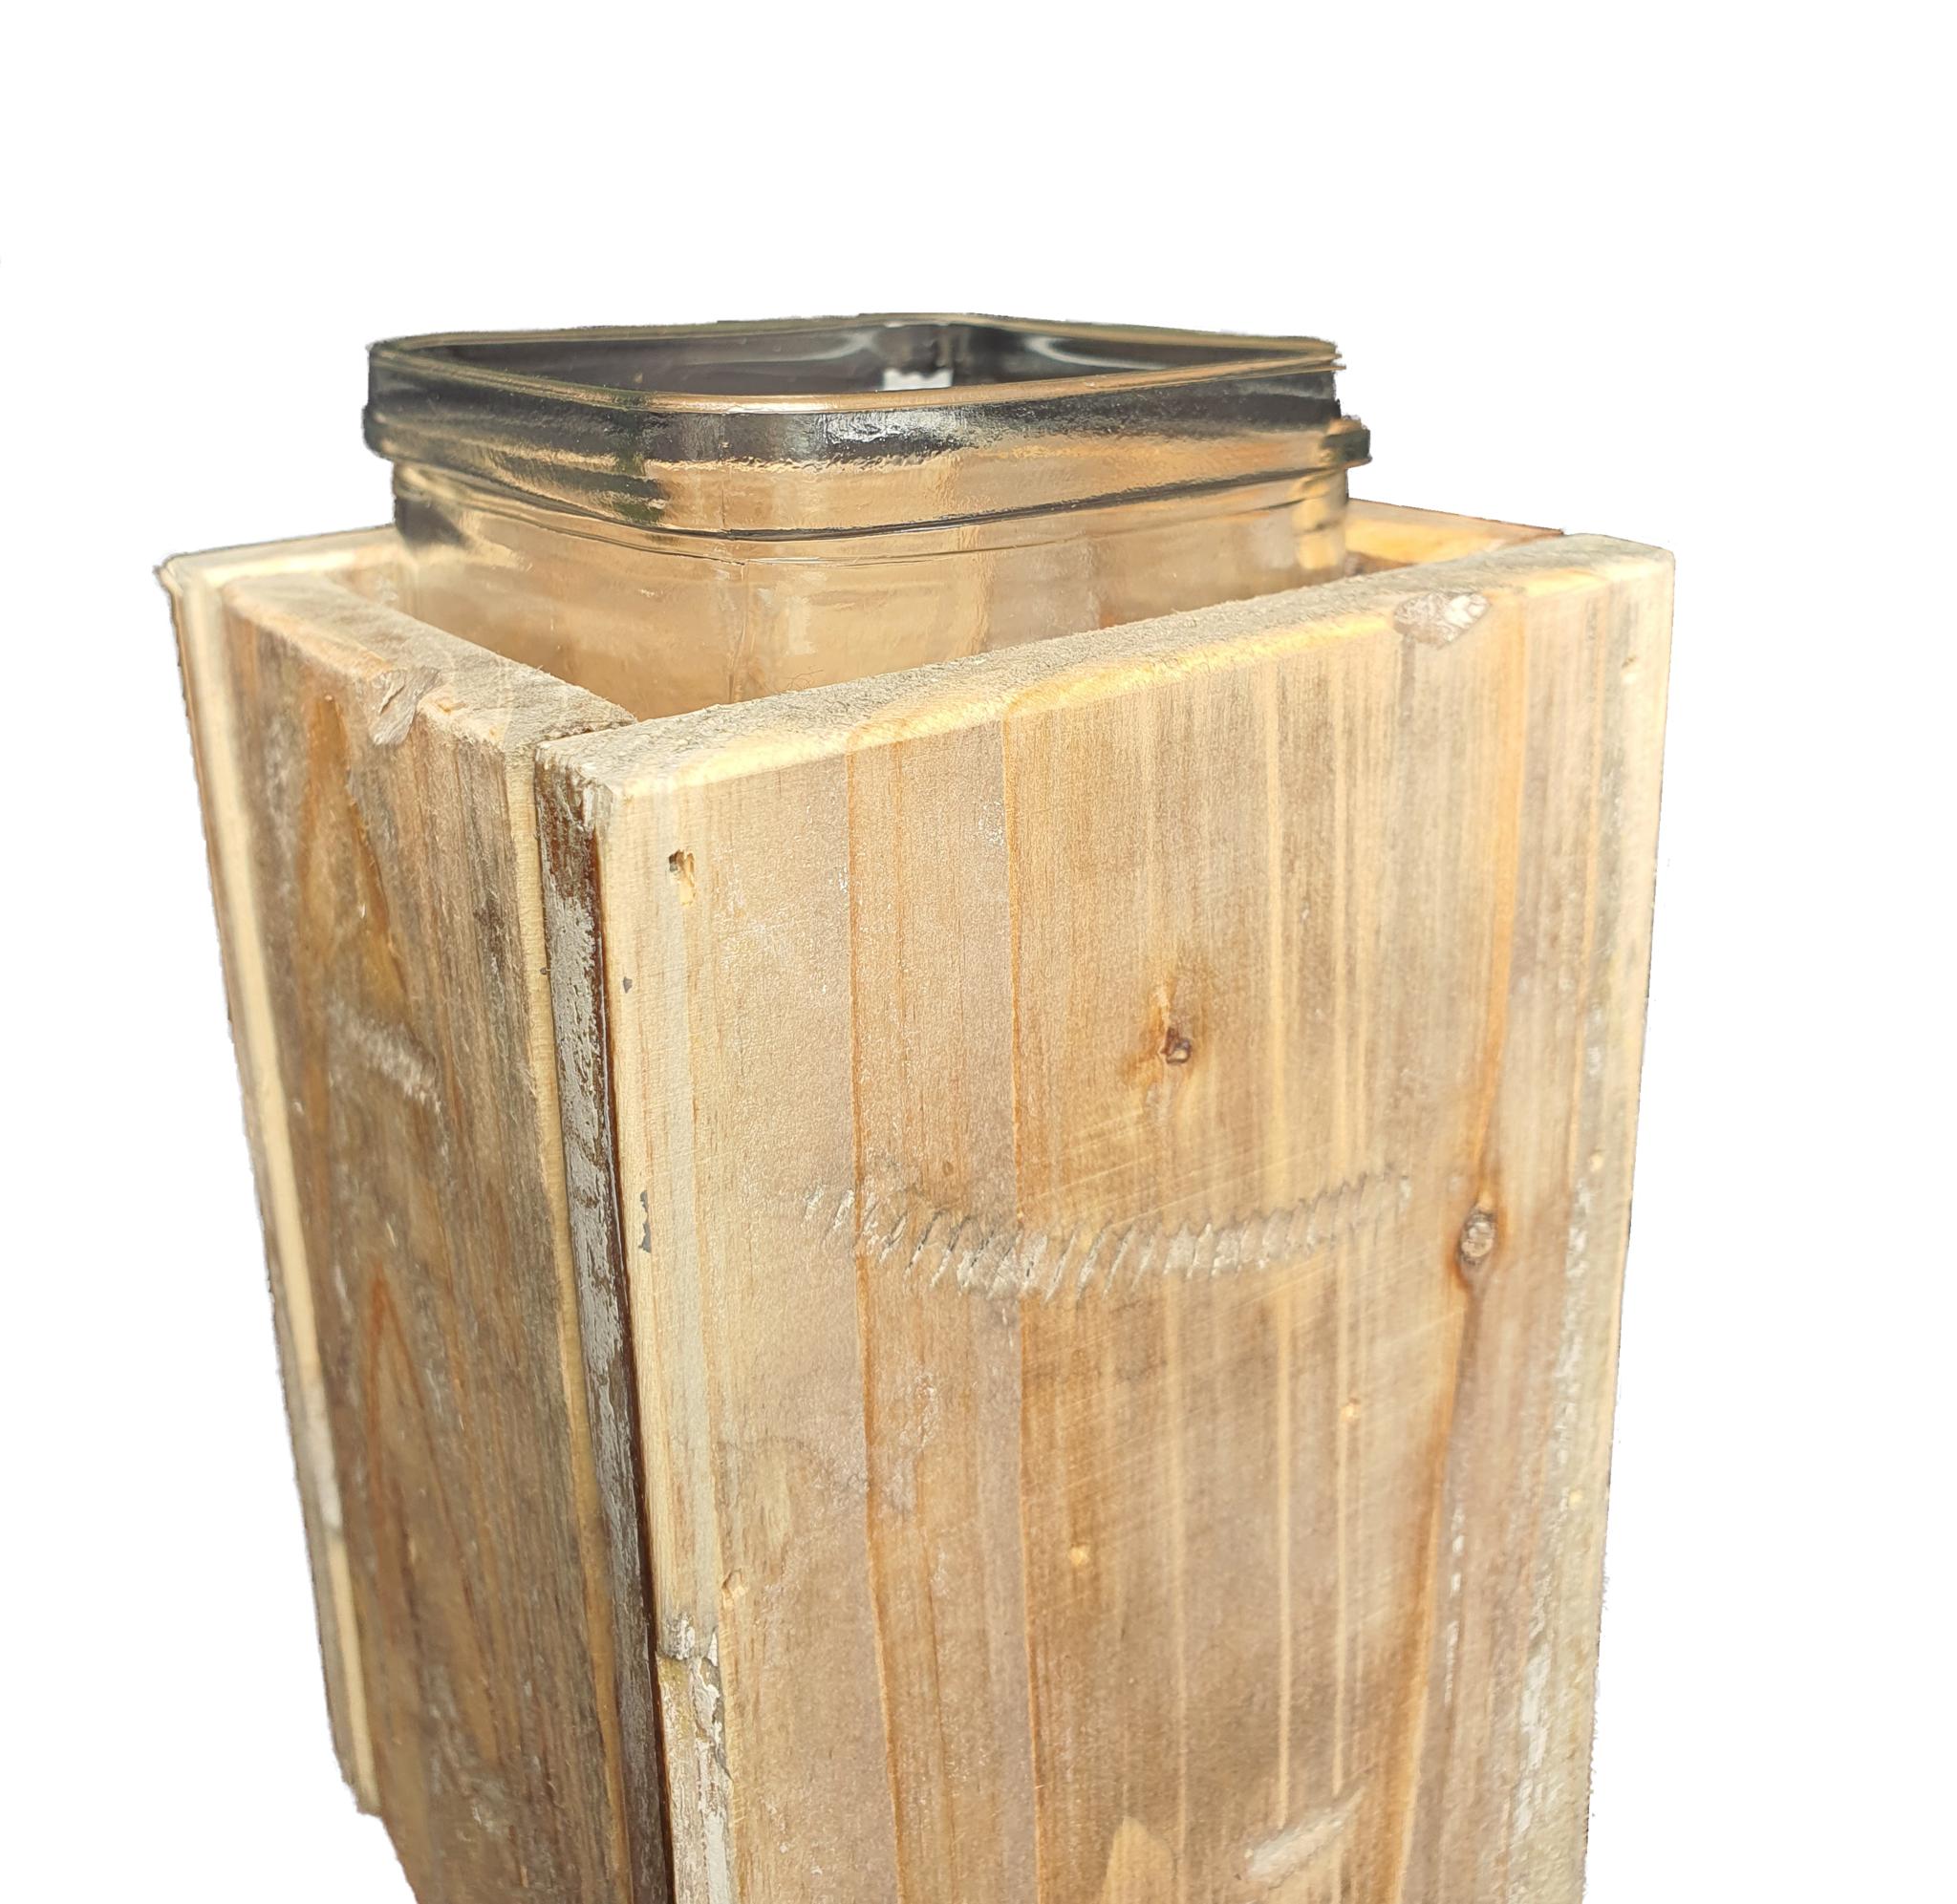 pot old dutchglass hold 2 sides 15-7